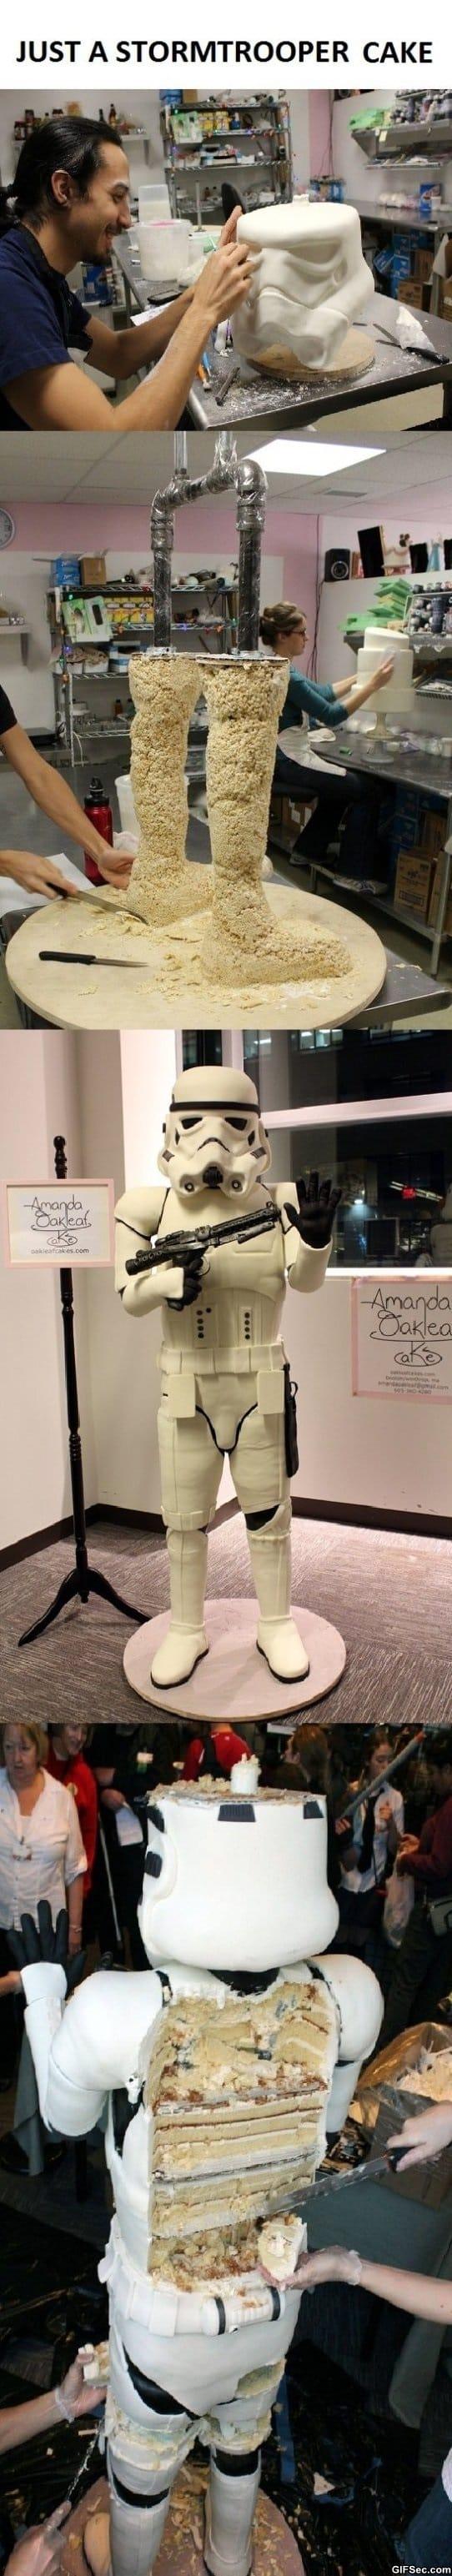 storm-trooper-cake